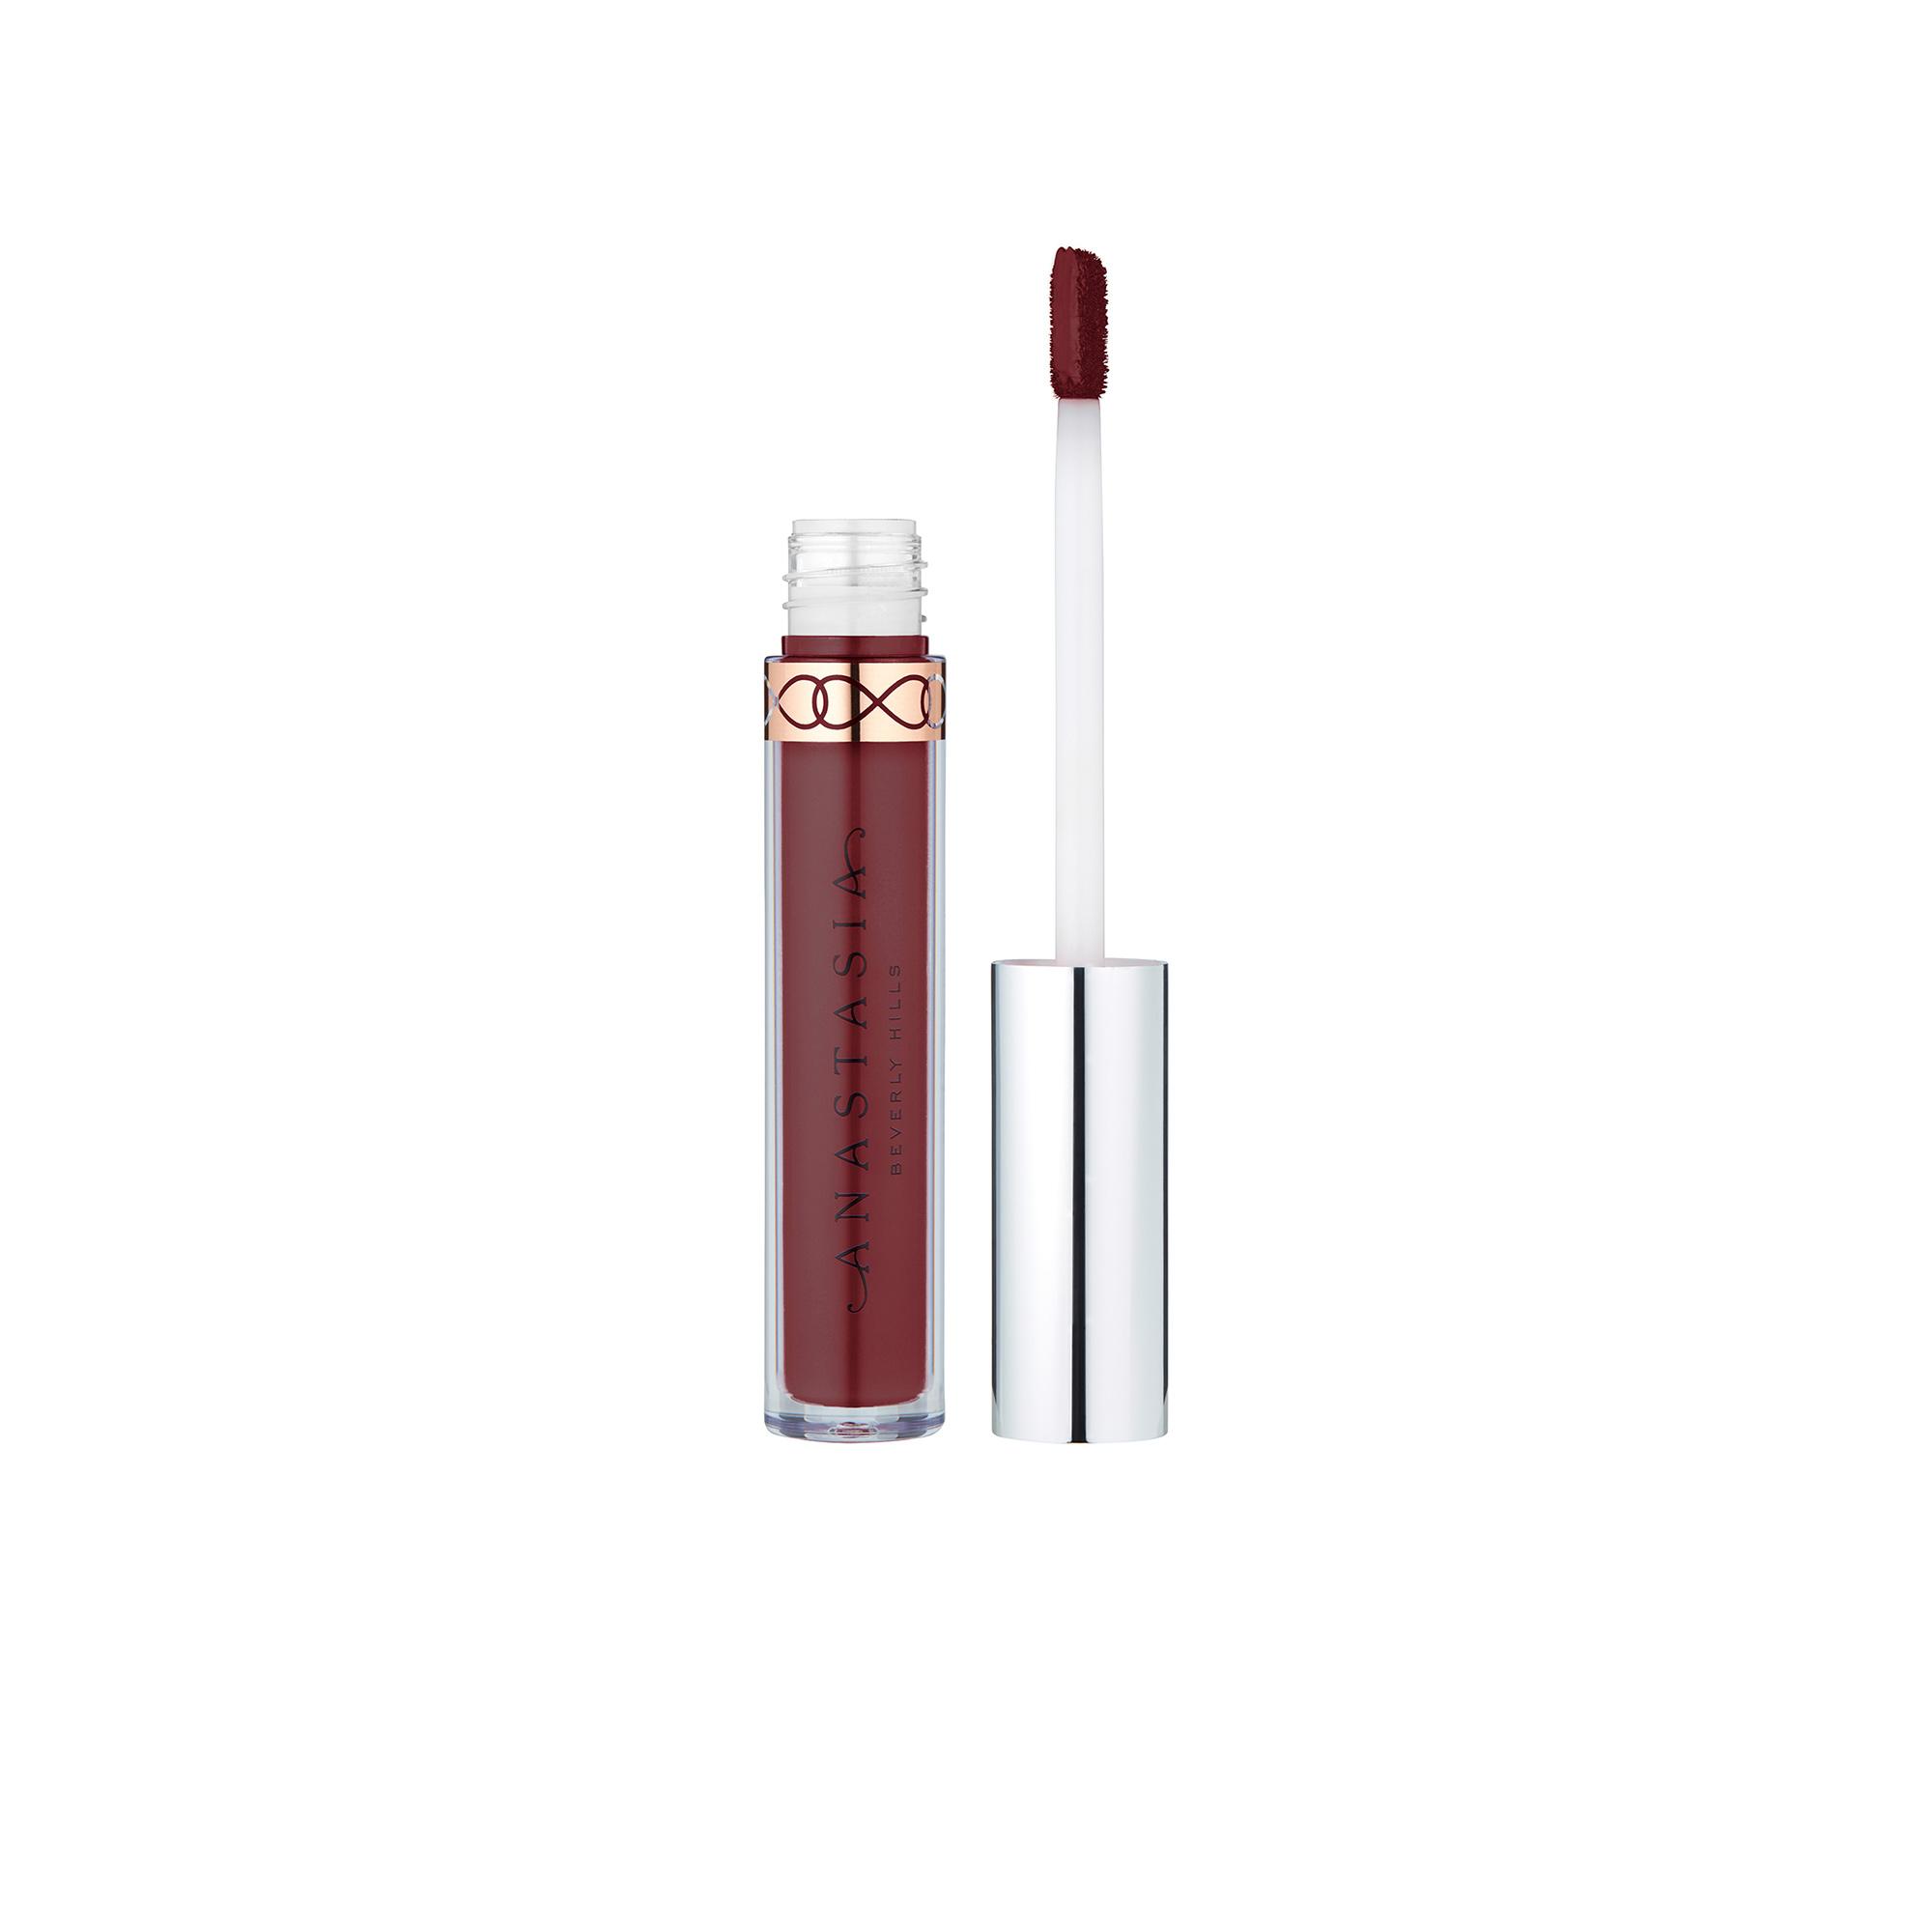 Anastasia Beverly Hills - Liquid Lipstick | Long-Wearing Matte Lipsticks